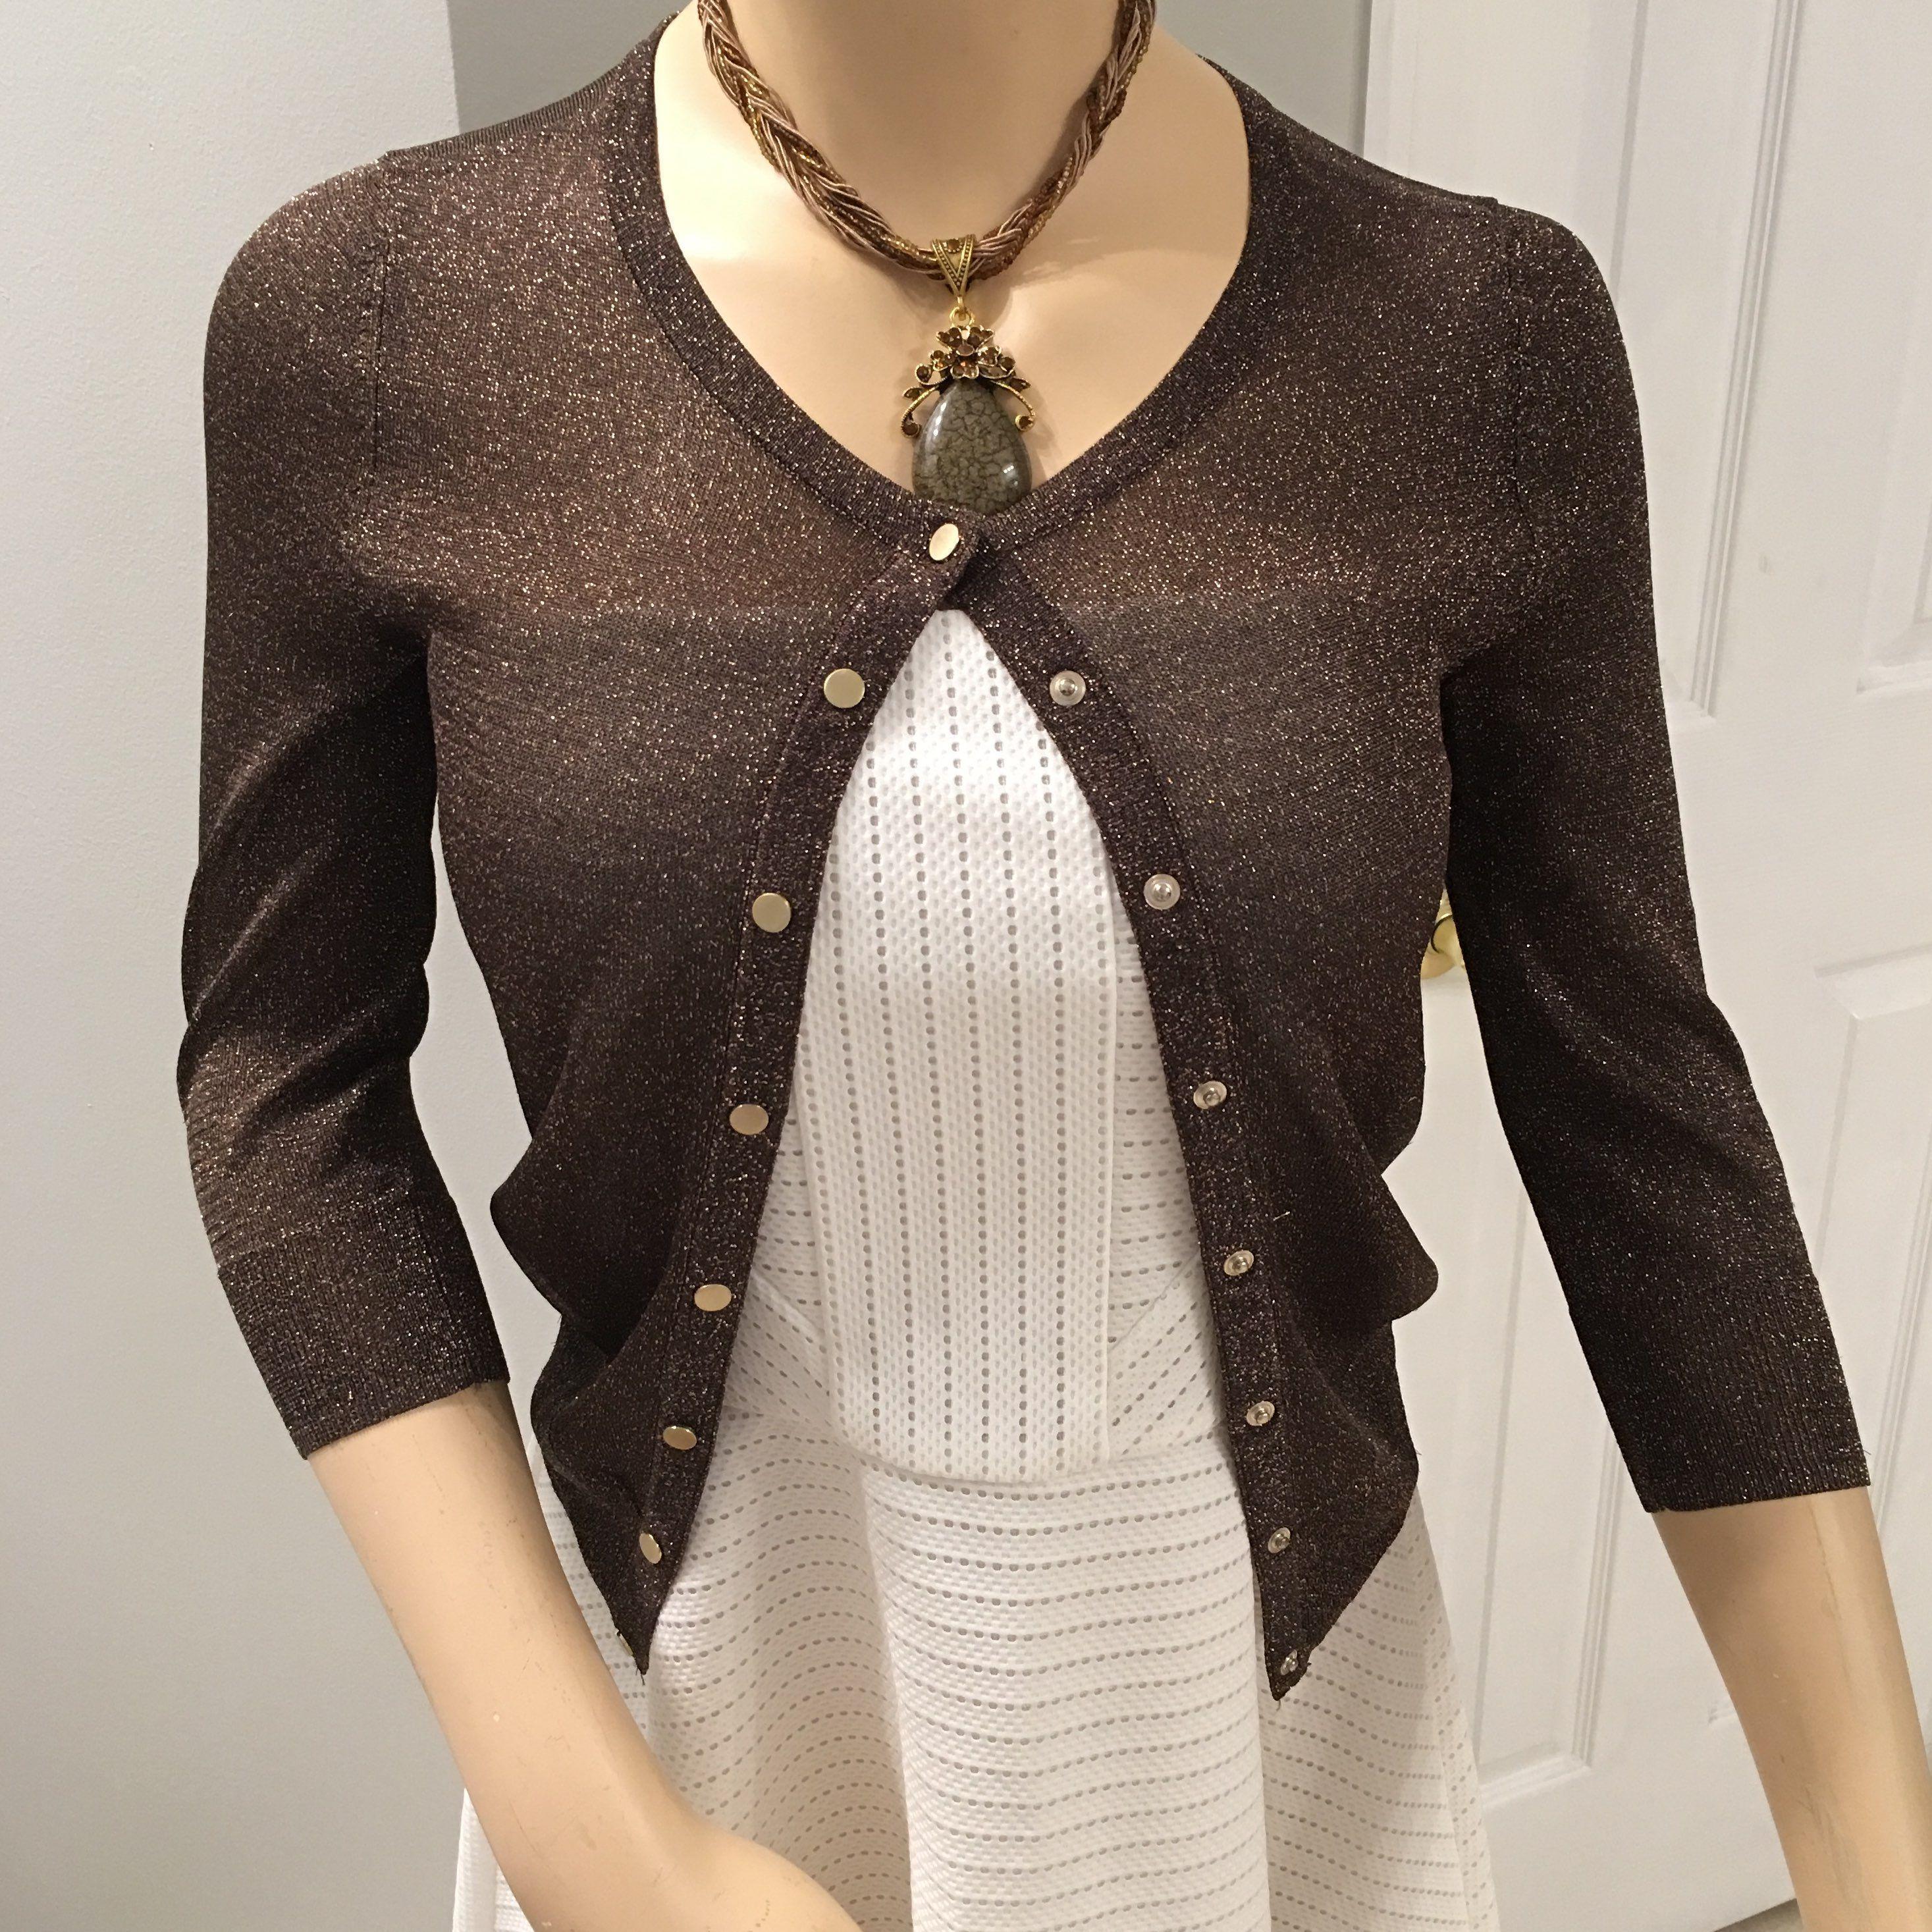 WHBM Brown/Gold Shimmer Cardigan XS - Mercari: BUY & SELL THINGS ...